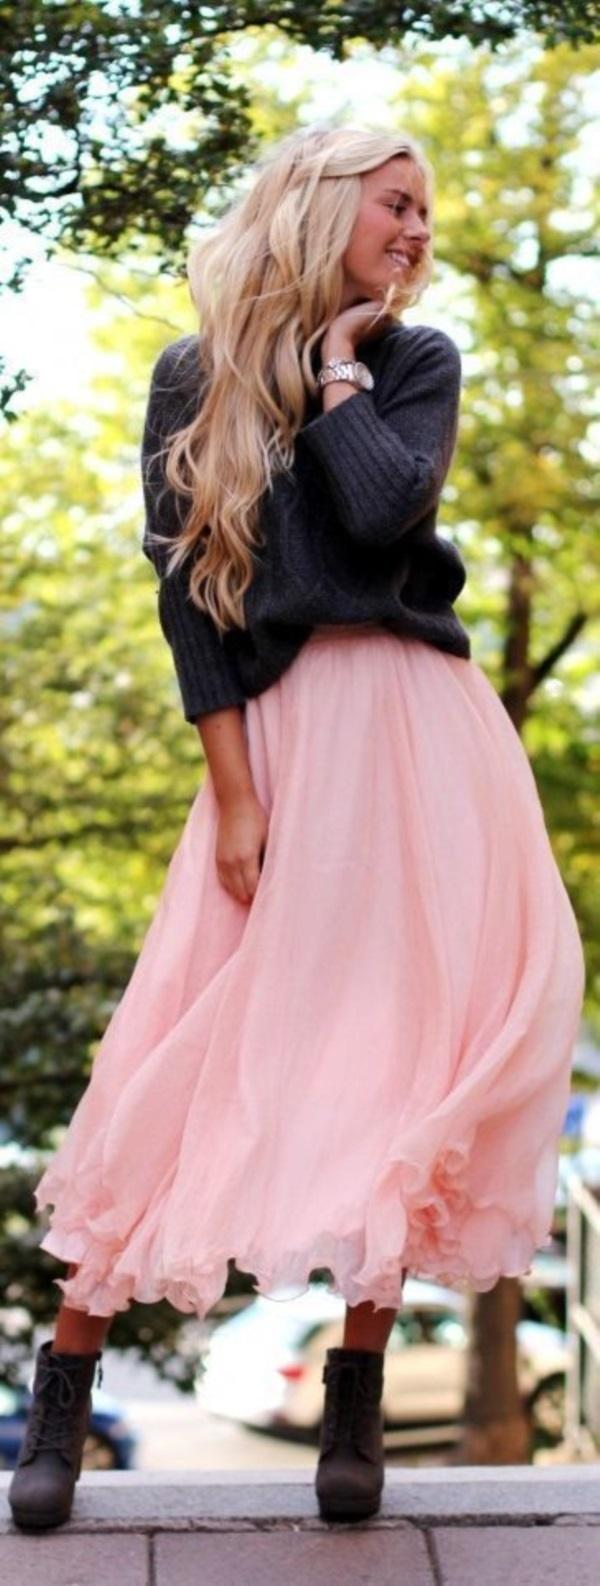 boho chic fashions outfits0301